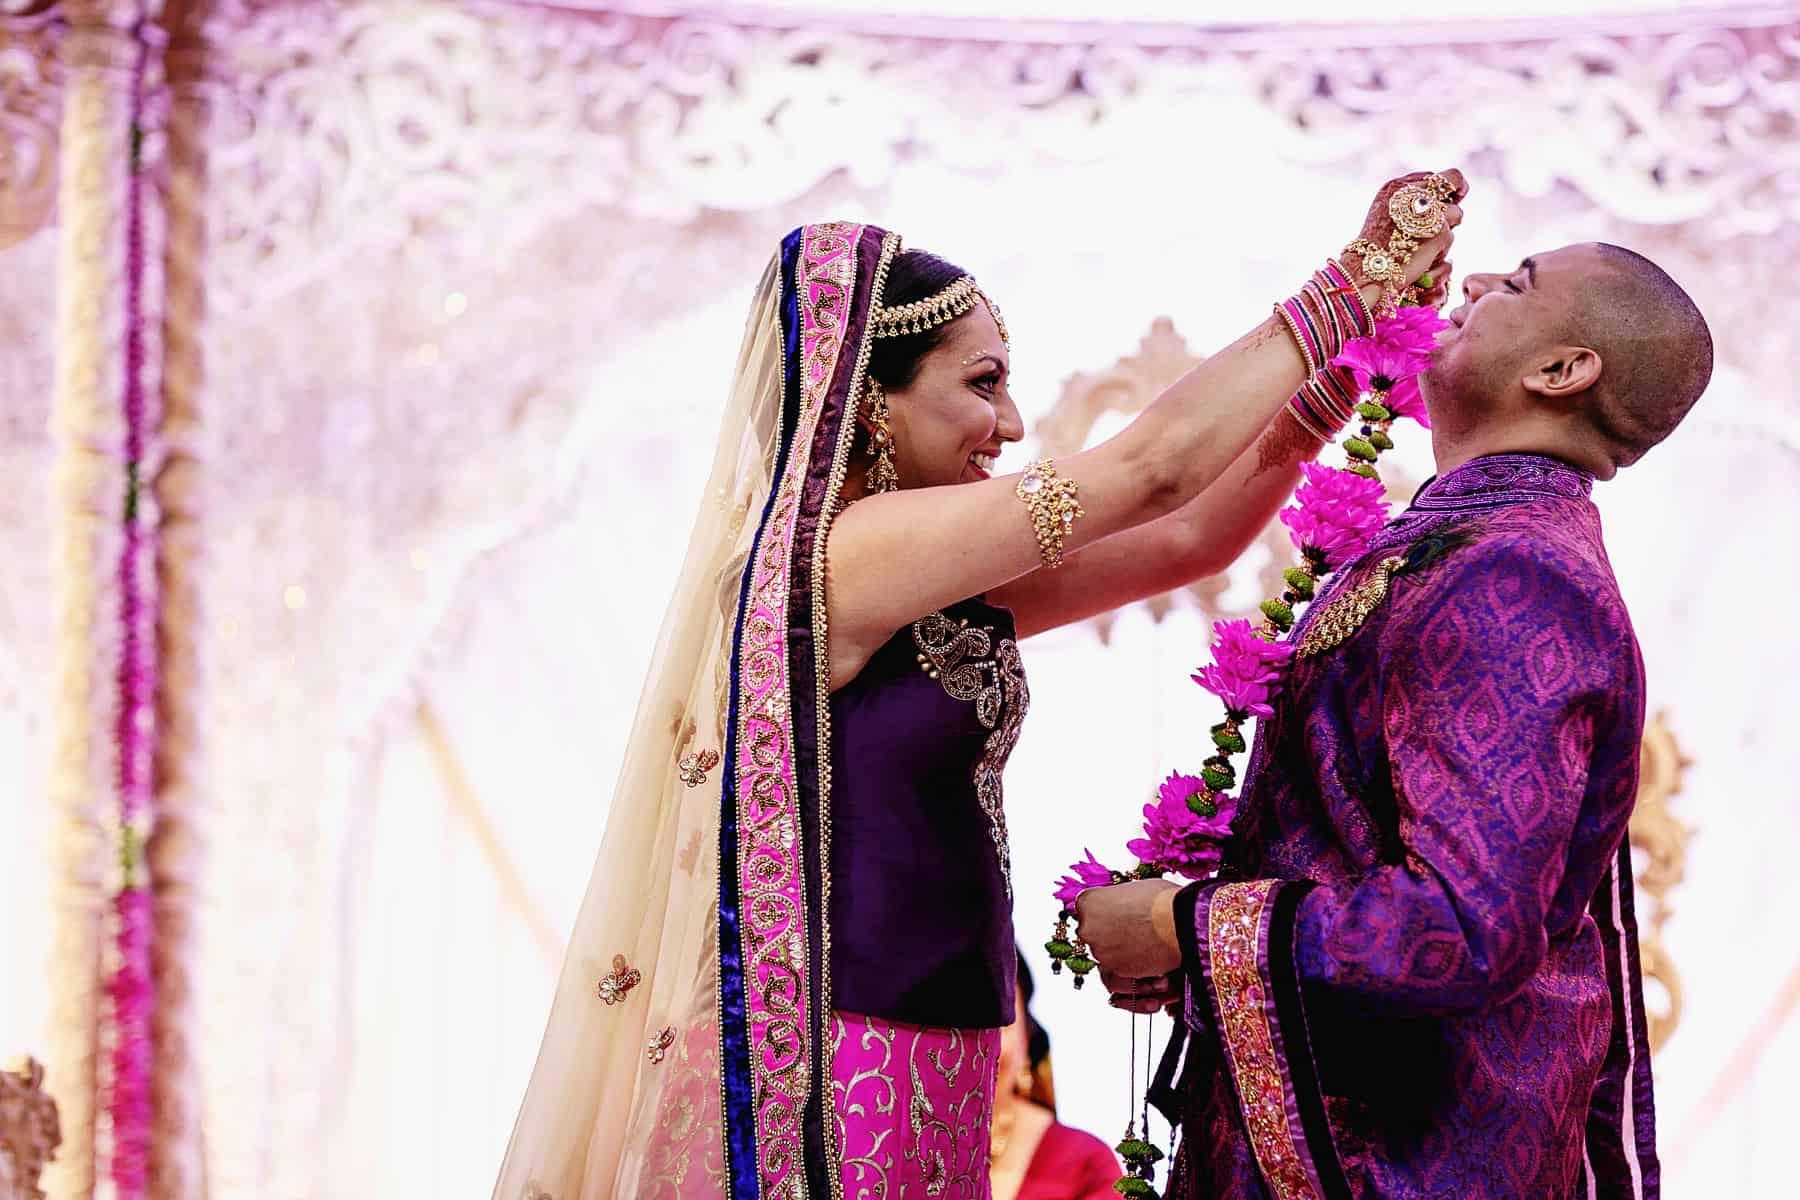 0014a indian wedding at syon park